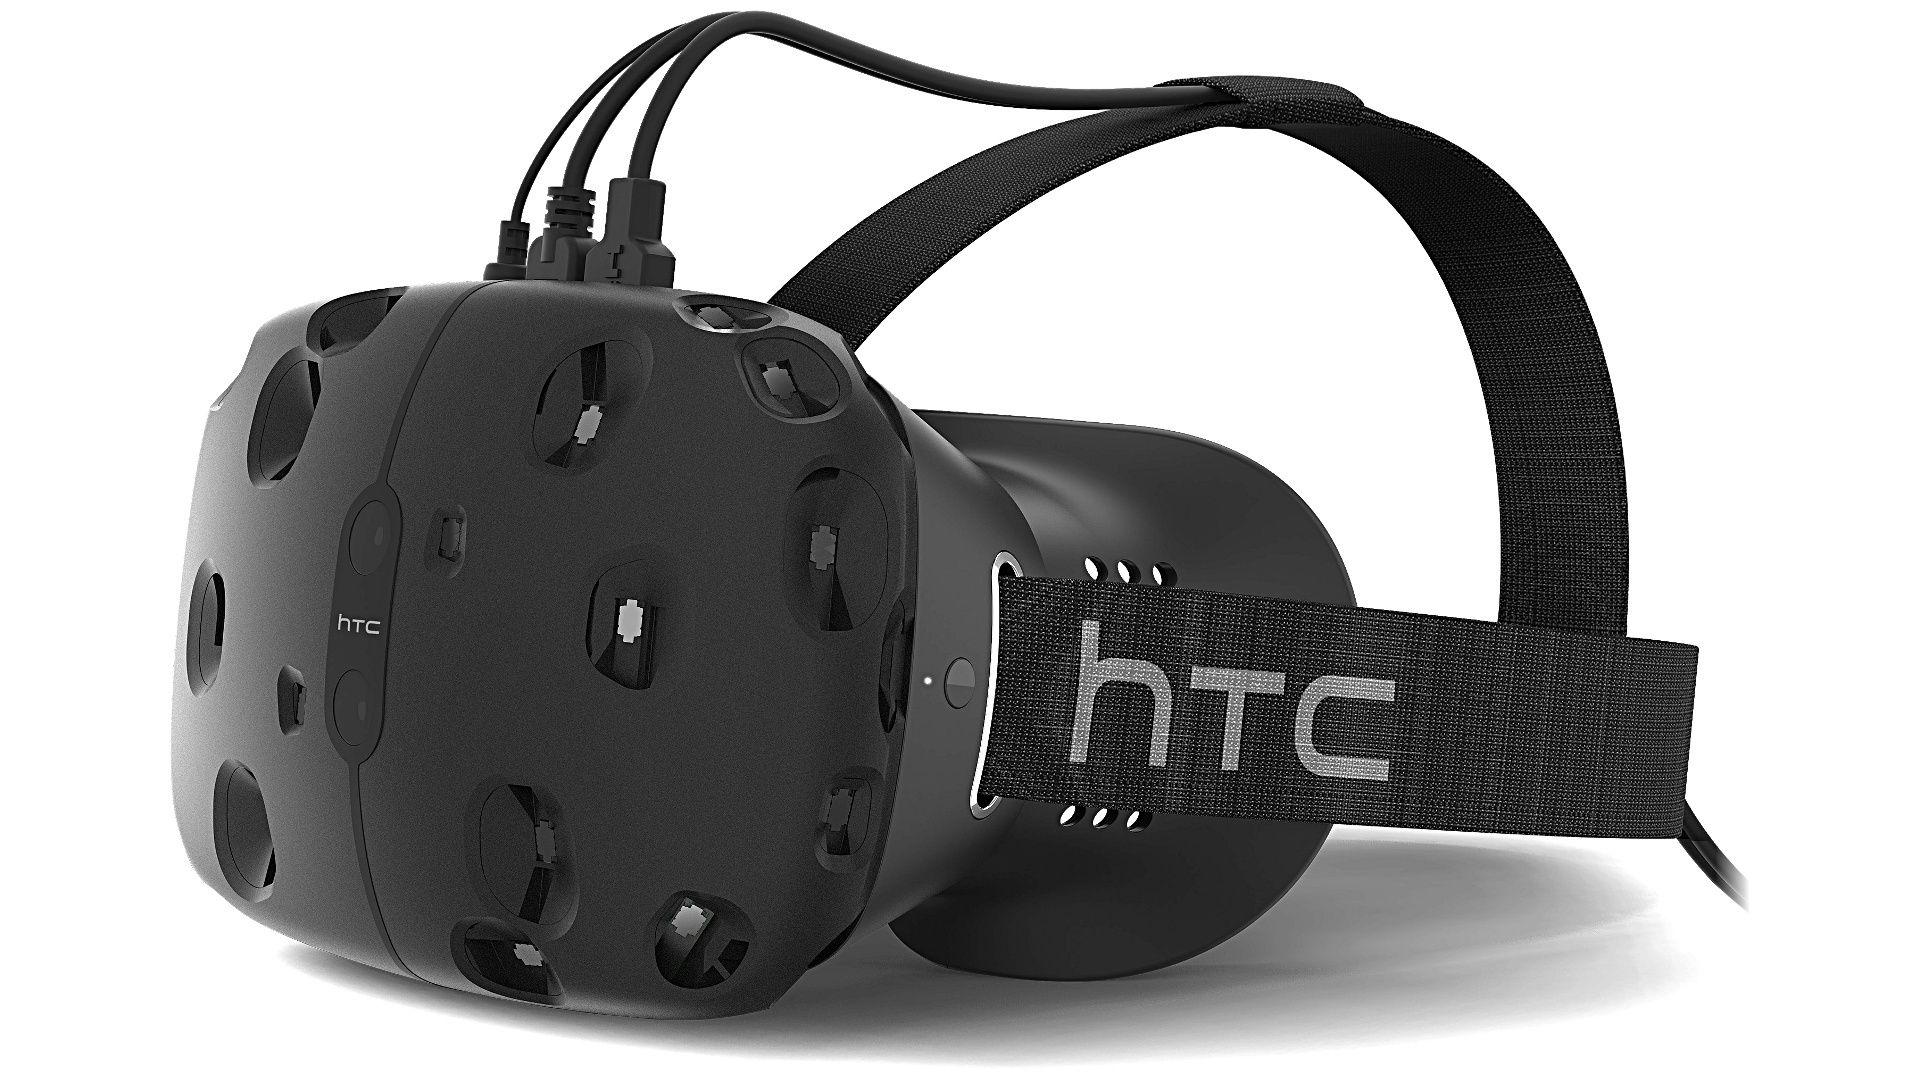 HTC Vive FAQs